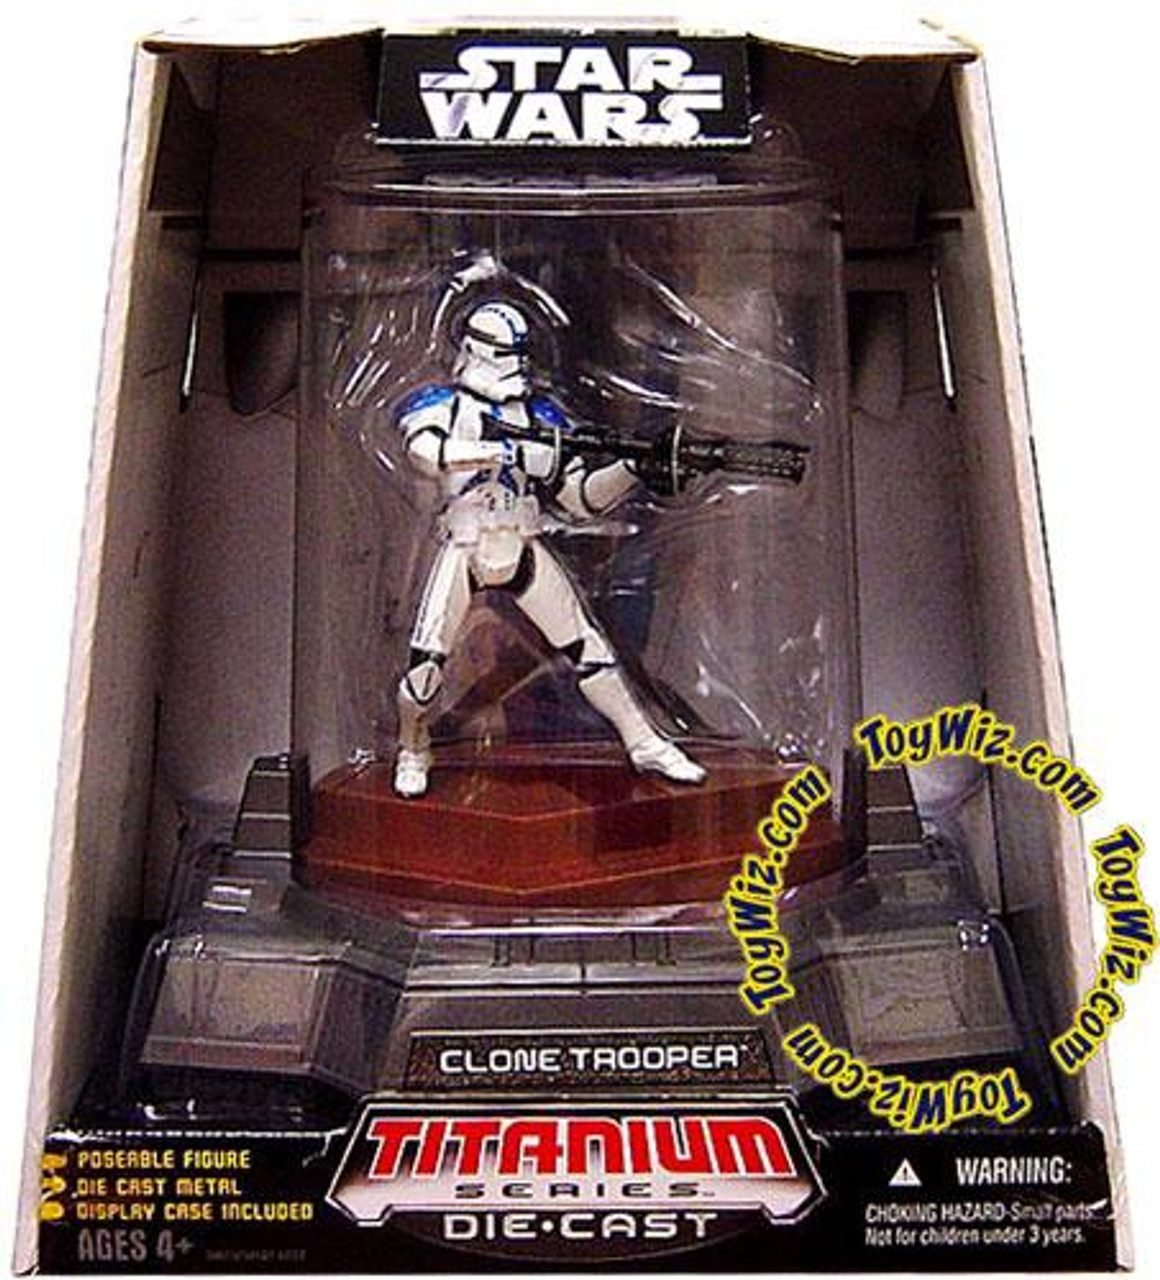 Star Wars The Clone Wars Titanium Series 2007 Clone Trooper Diecast Figure